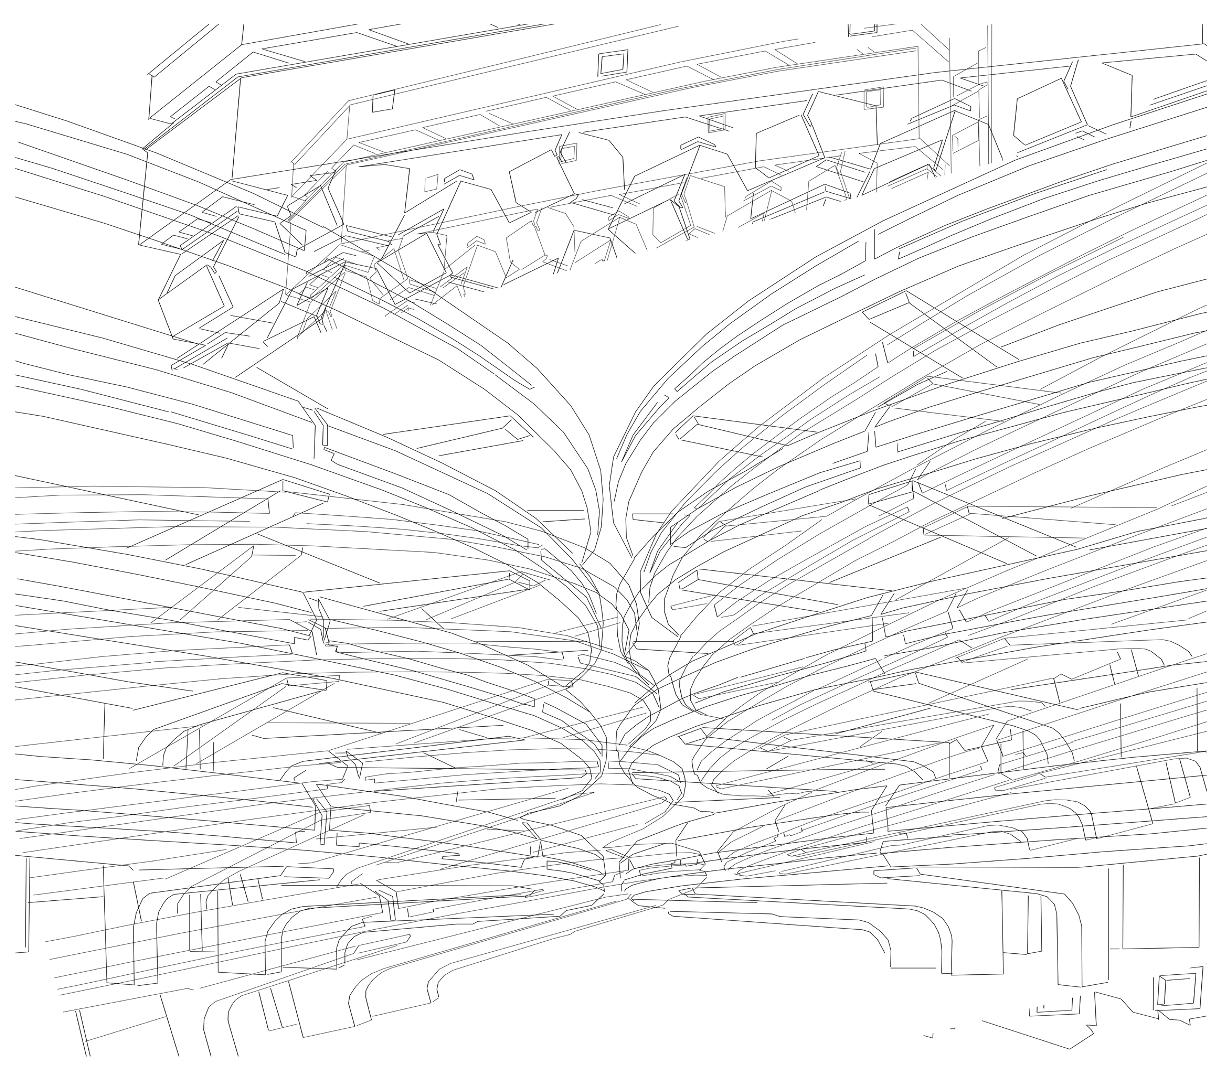 Paradigma: Alejandro Vega Baró's Digital Drawings You Must See